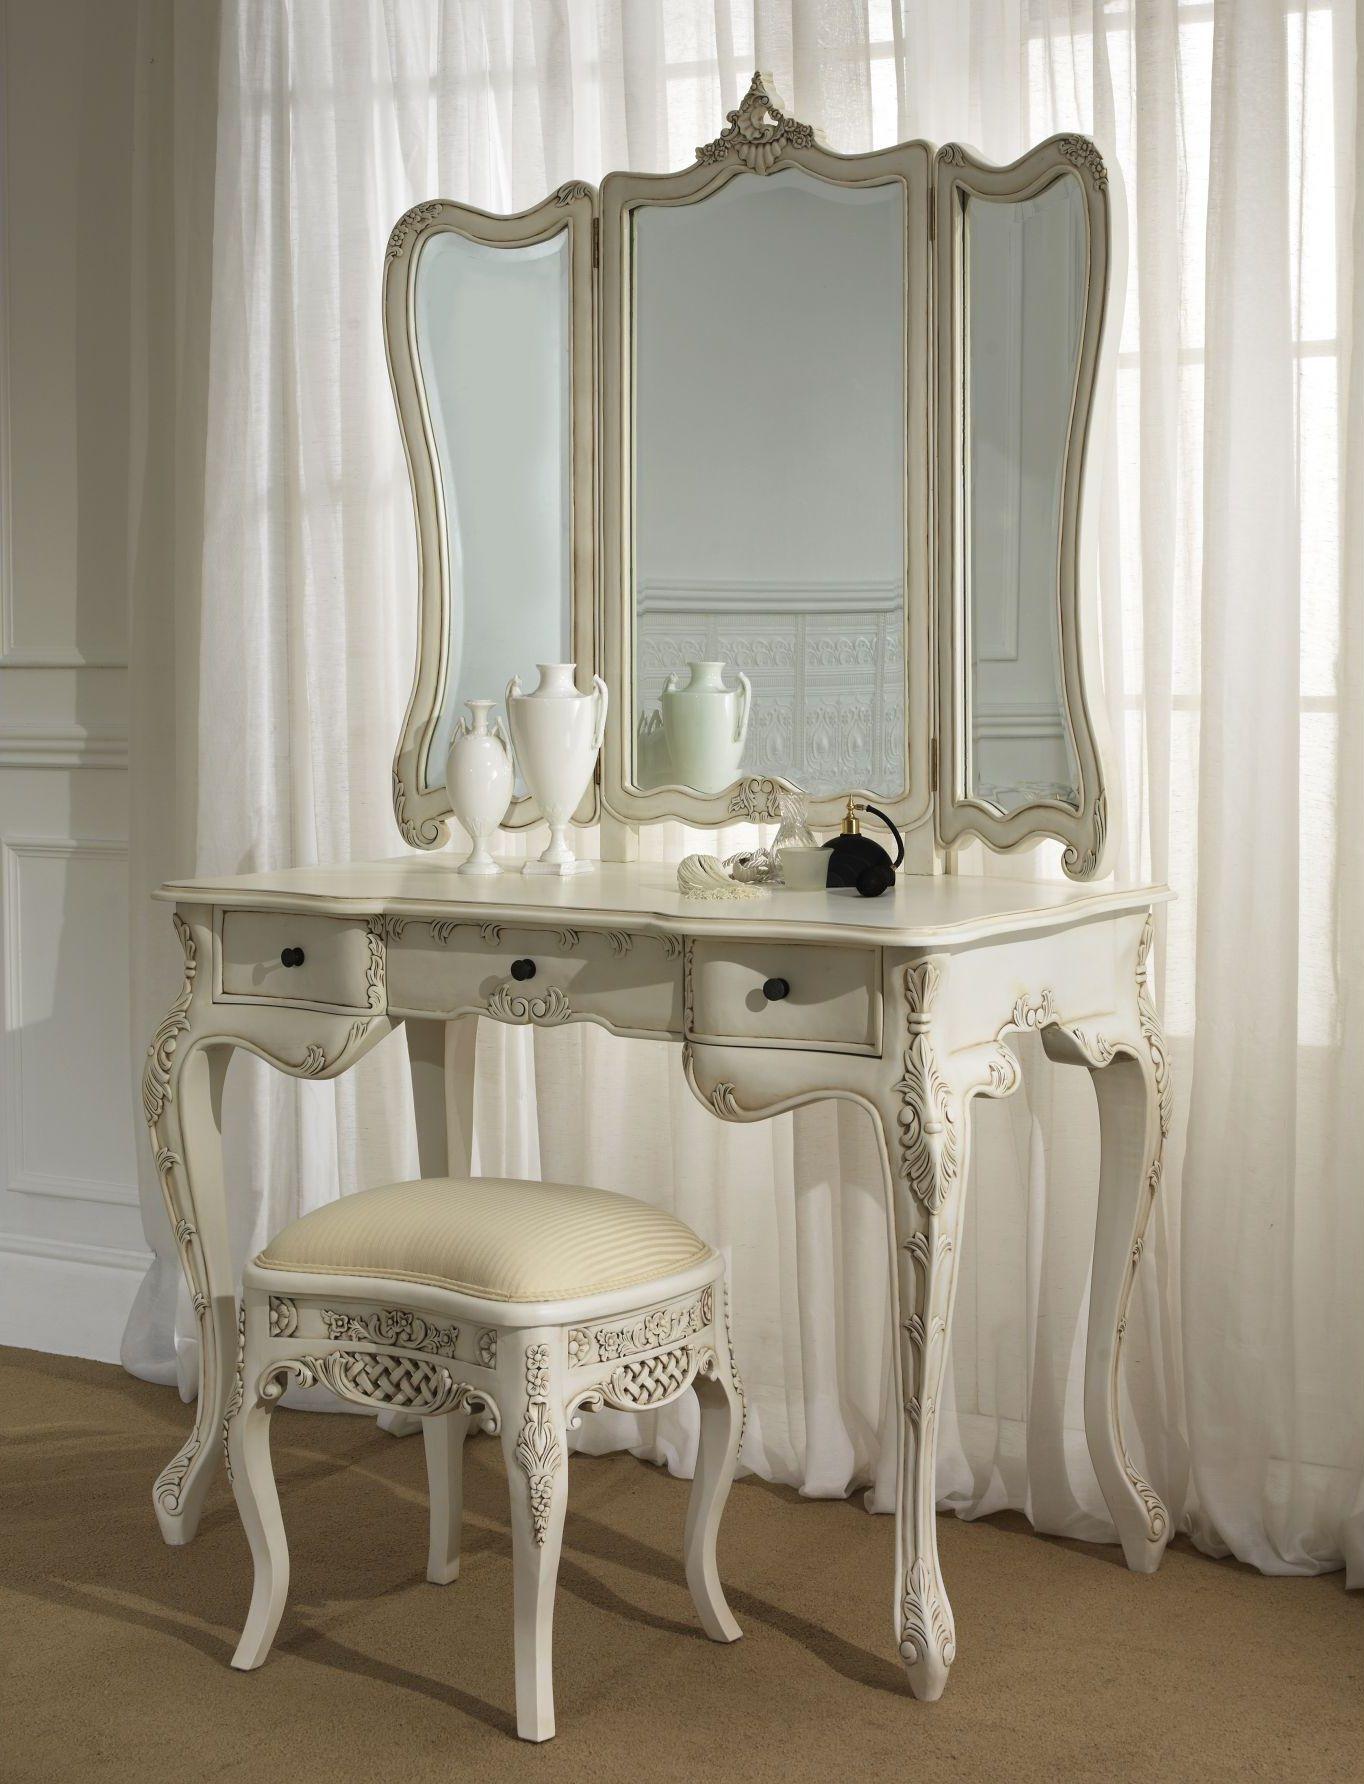 French provincial dressing table Vintage bedroom